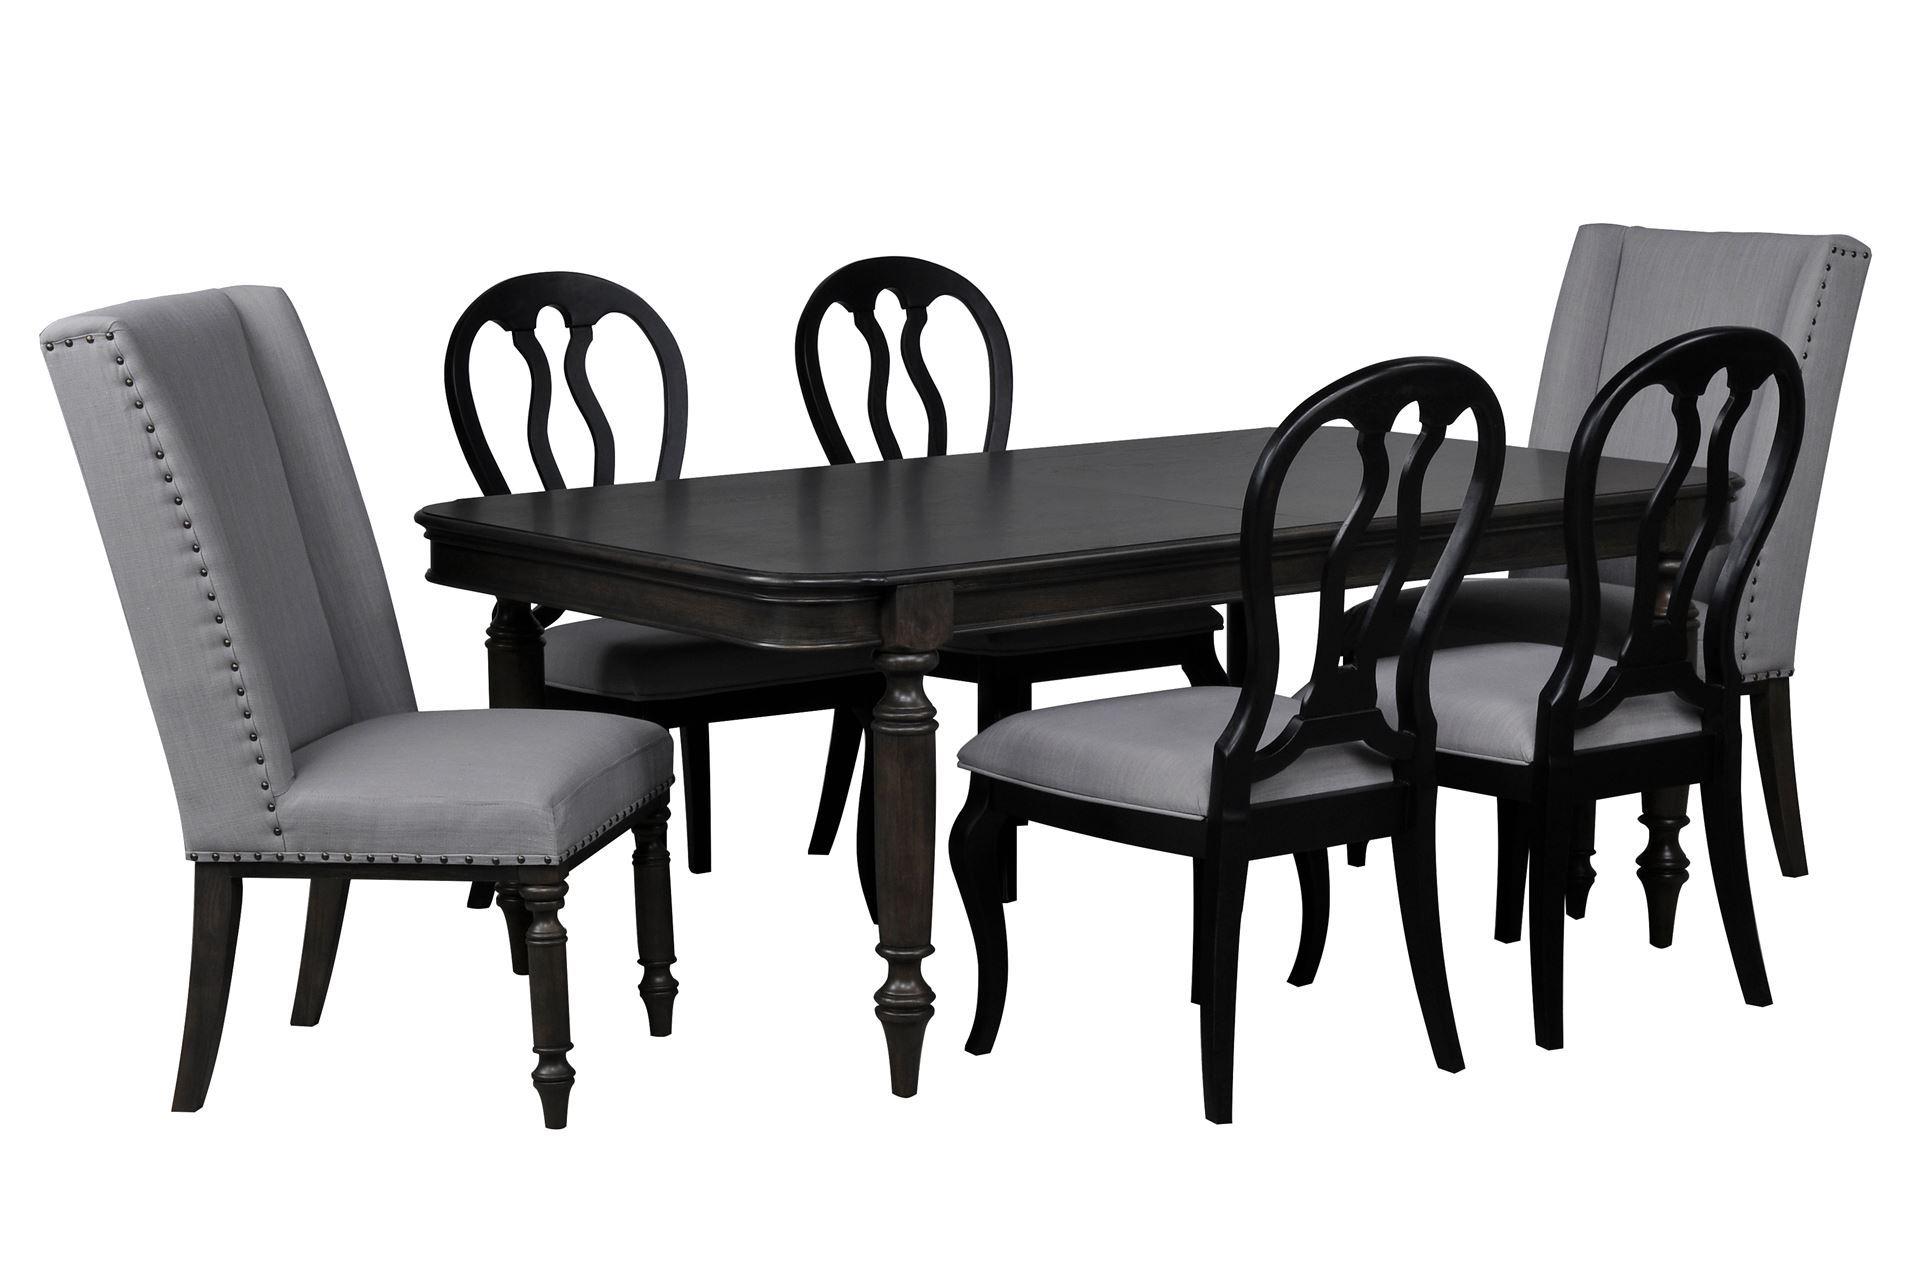 laurel 7 piece dining set w black side chairs living spaces. Black Bedroom Furniture Sets. Home Design Ideas